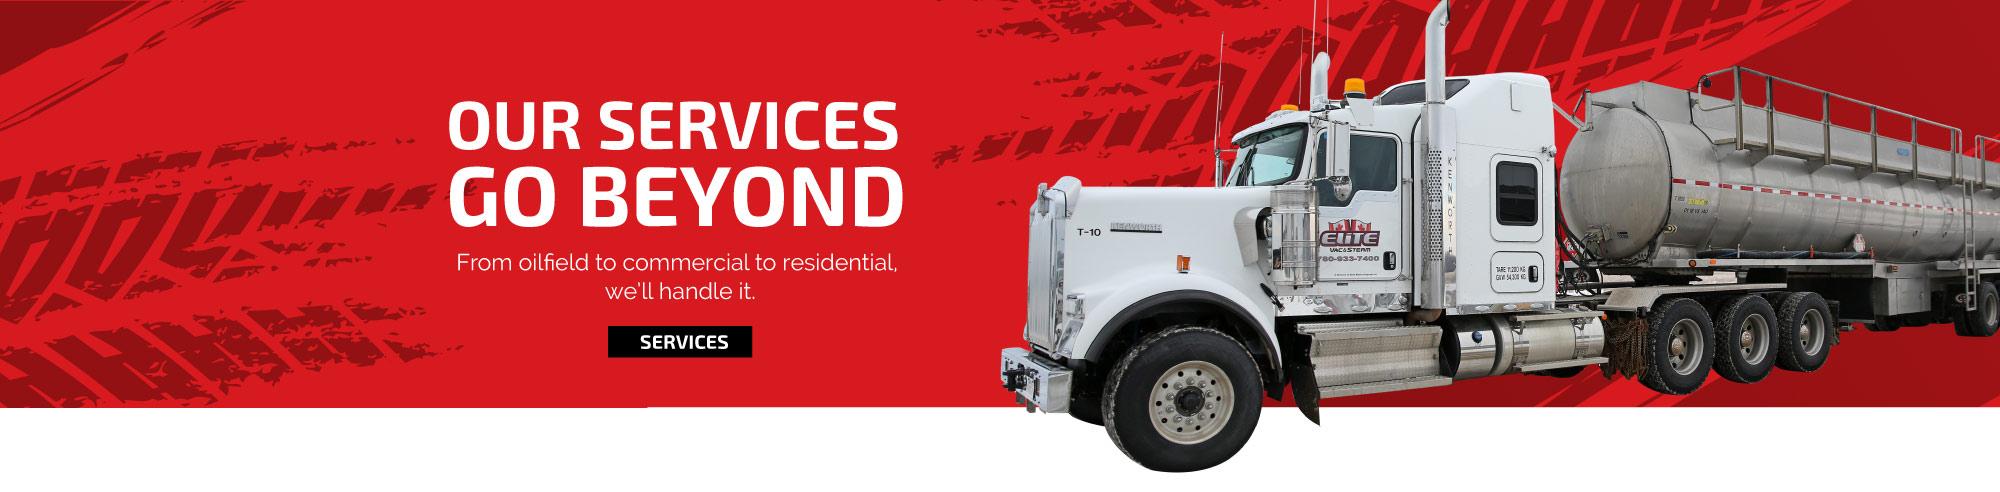 Elite Vac & Steam - Vacuum/Steam and Fluid Hauling Services - Grande Prairie, AB Slide 2